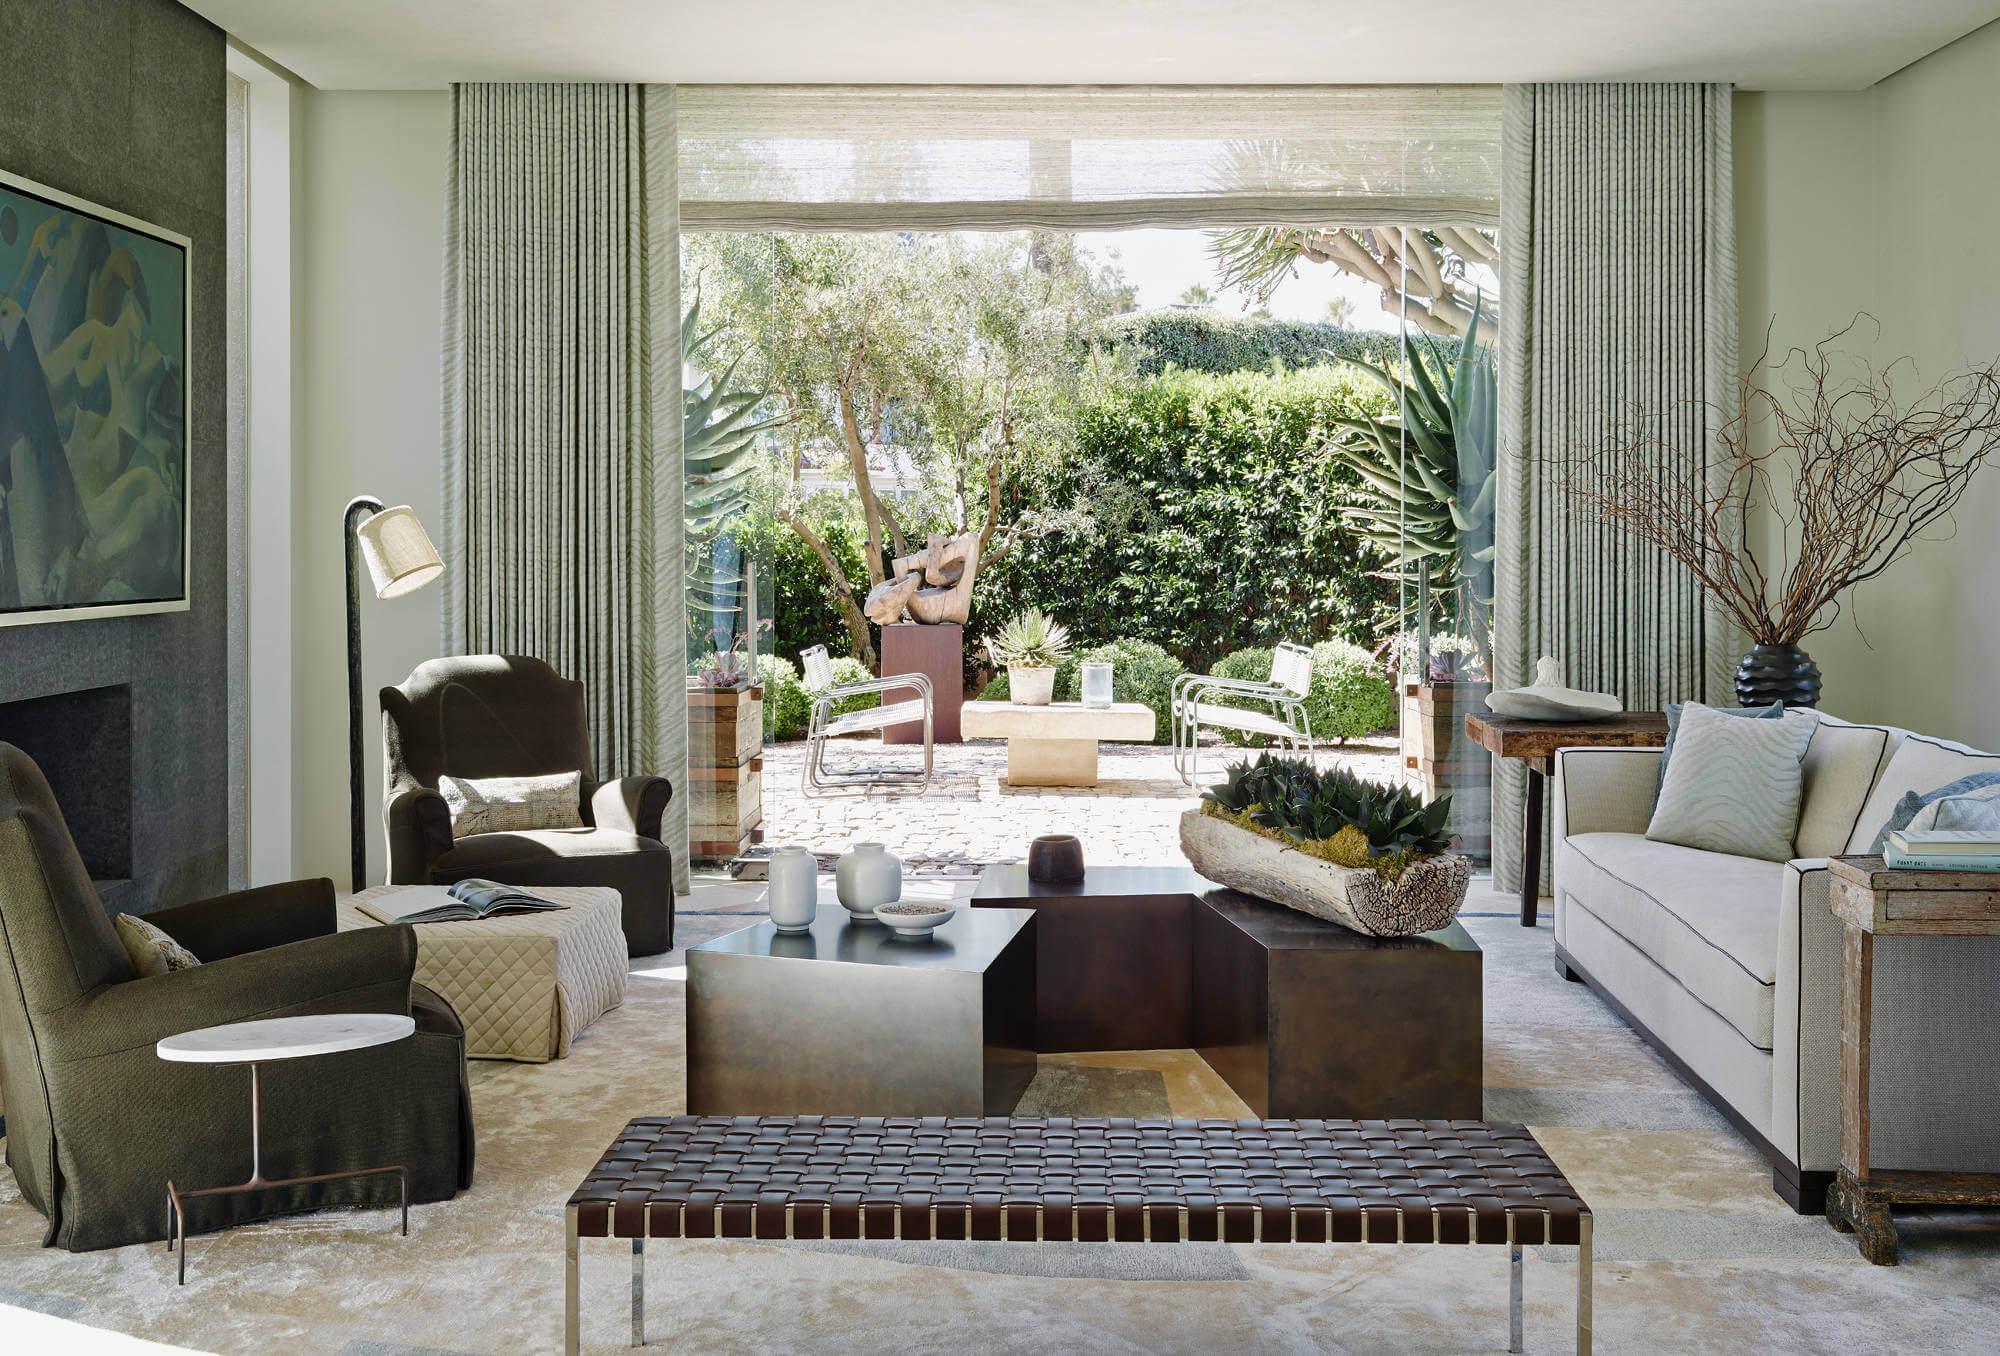 Mediterranean Coronado Residence near San Diego by Island Architects-06